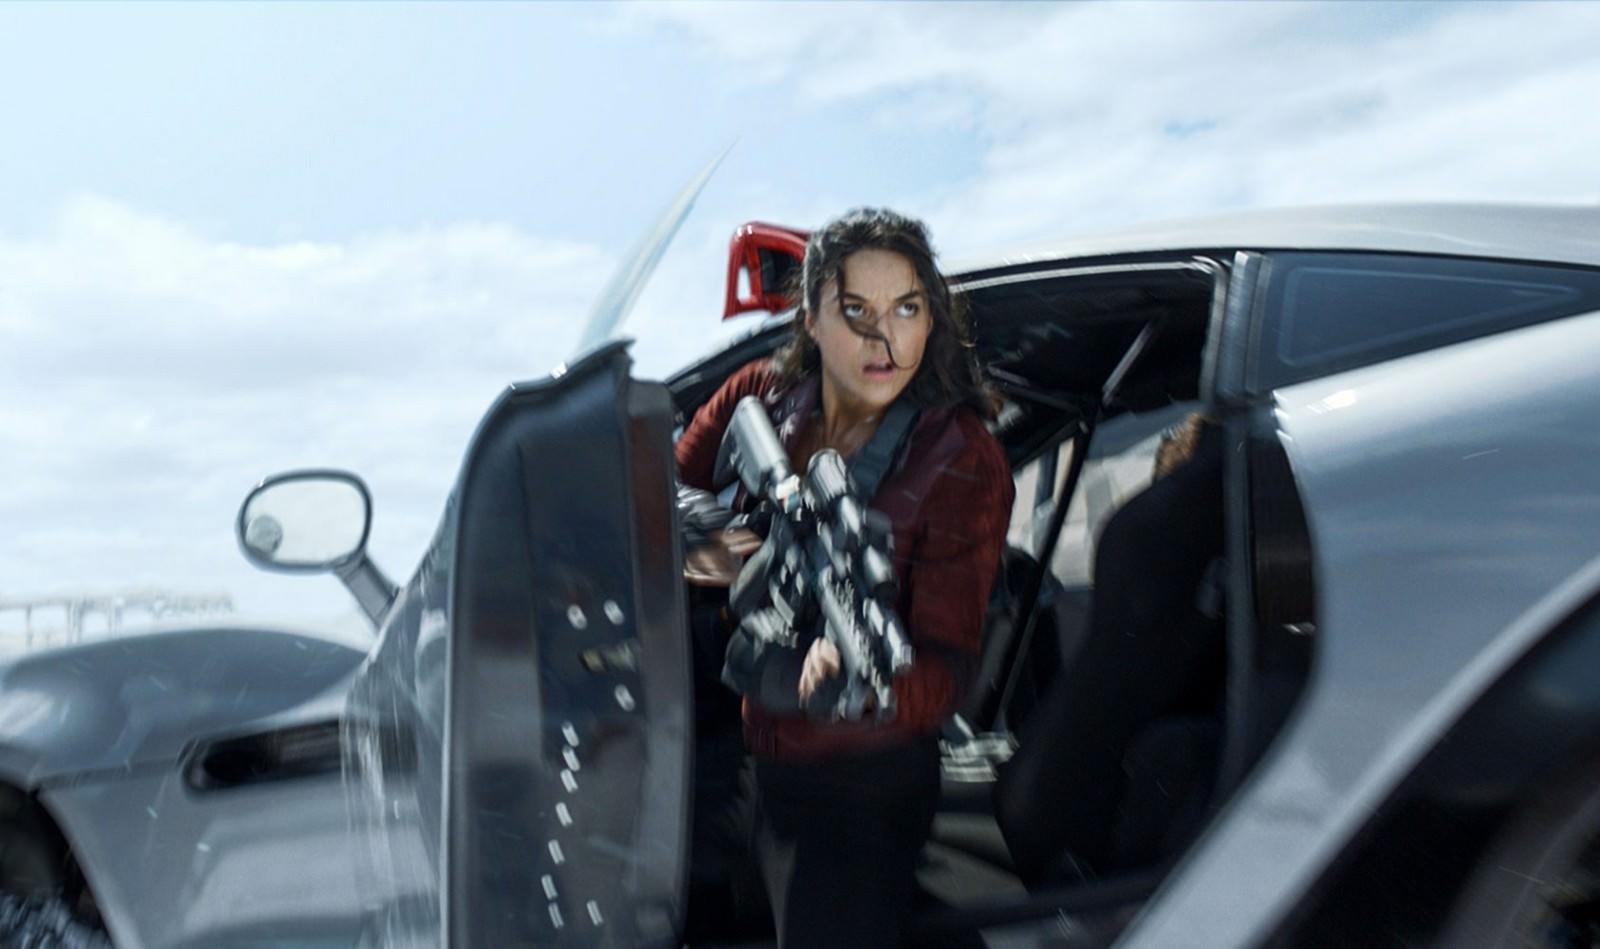 Movie, The Fate of the Furious(美國, 2017年) / 玩命關頭8(台灣) / 速度与激情8(中國) / 狂野時速8(香港), 電影角色與演員介紹